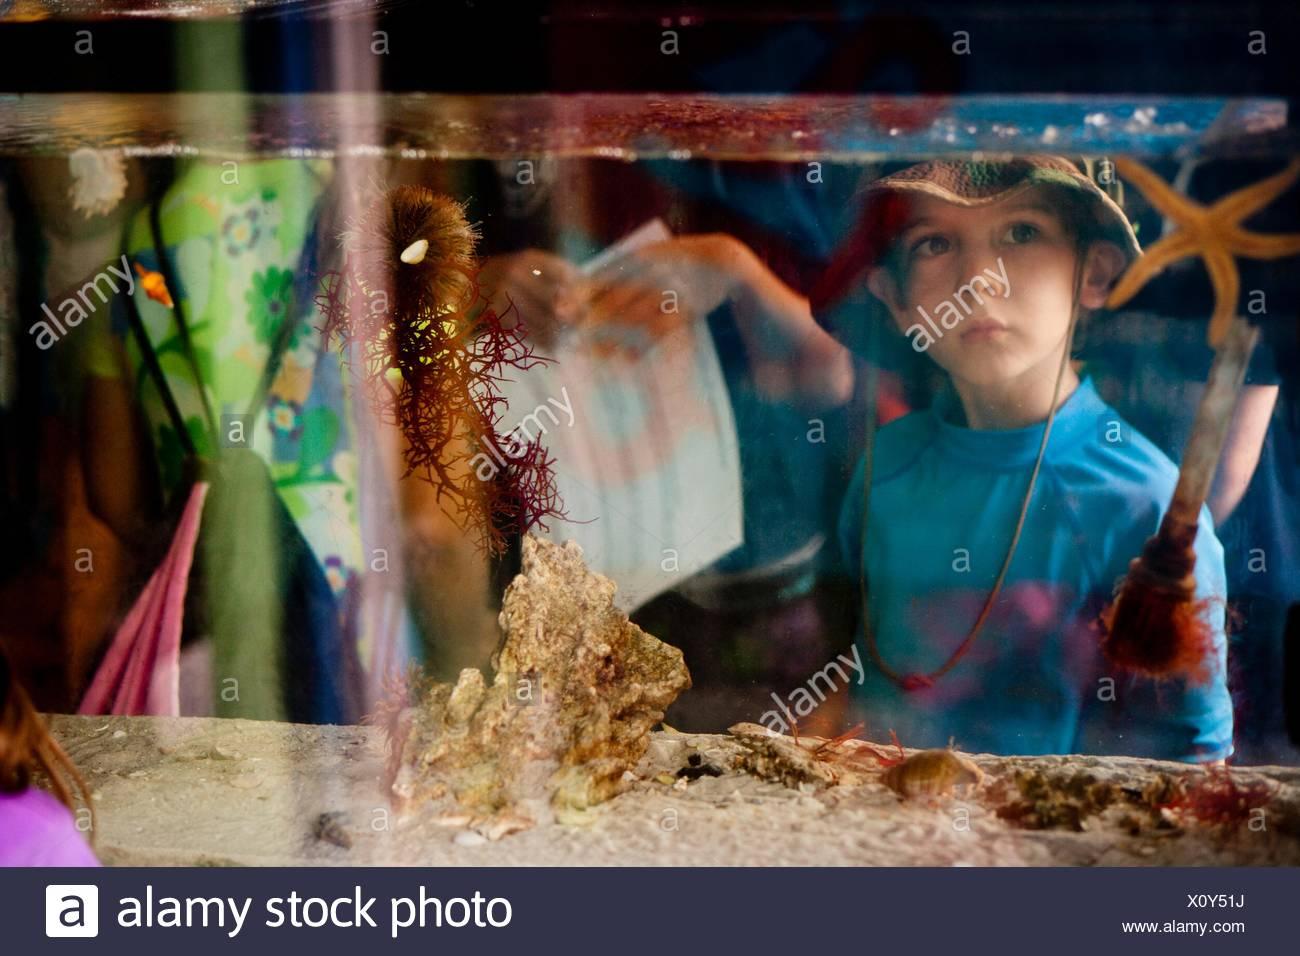 View through salt water aquarium of young boy looking at starfish - Stock Image